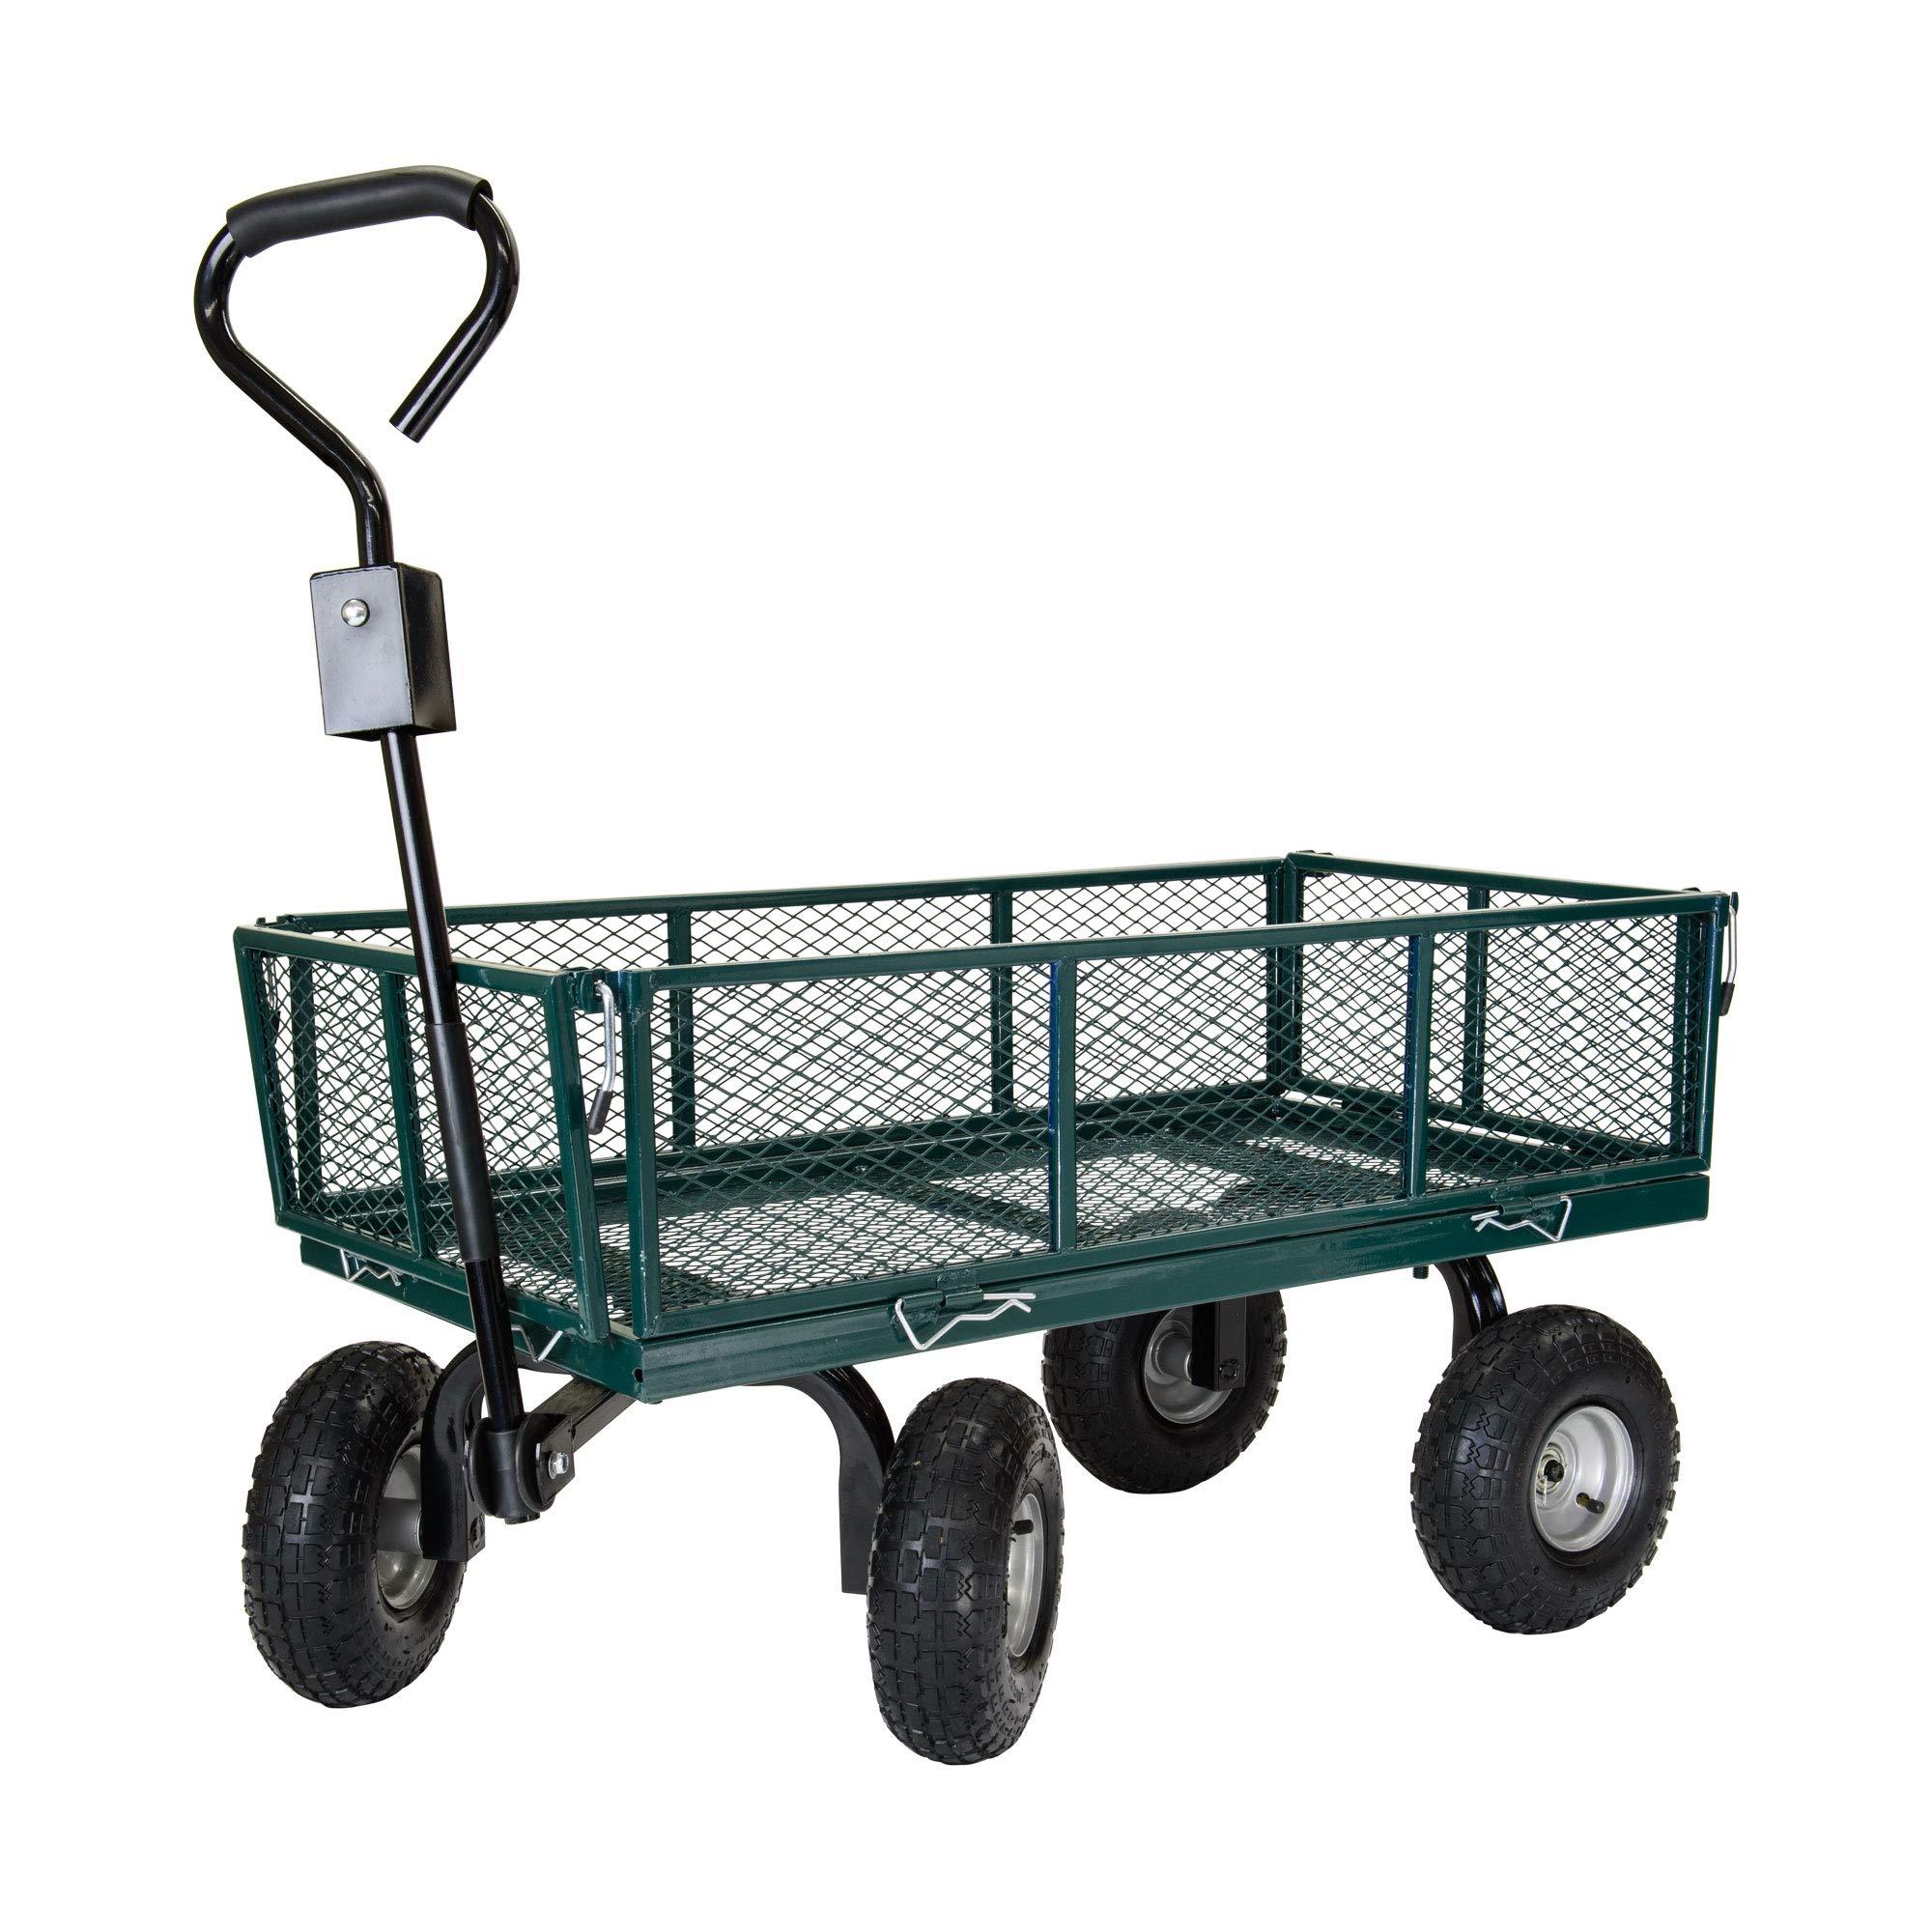 Garden Star 70107 Utility Cart with Sidewalls